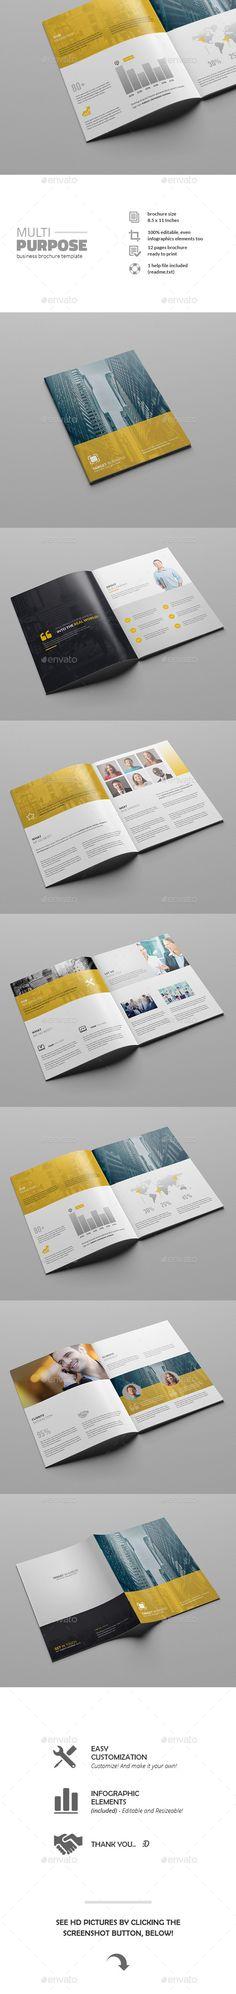 Multipurpose Business Brochure Template #design Download: http://graphicriver.net/item/multipurpose-business-brochure-template/11769942?ref=ksioks